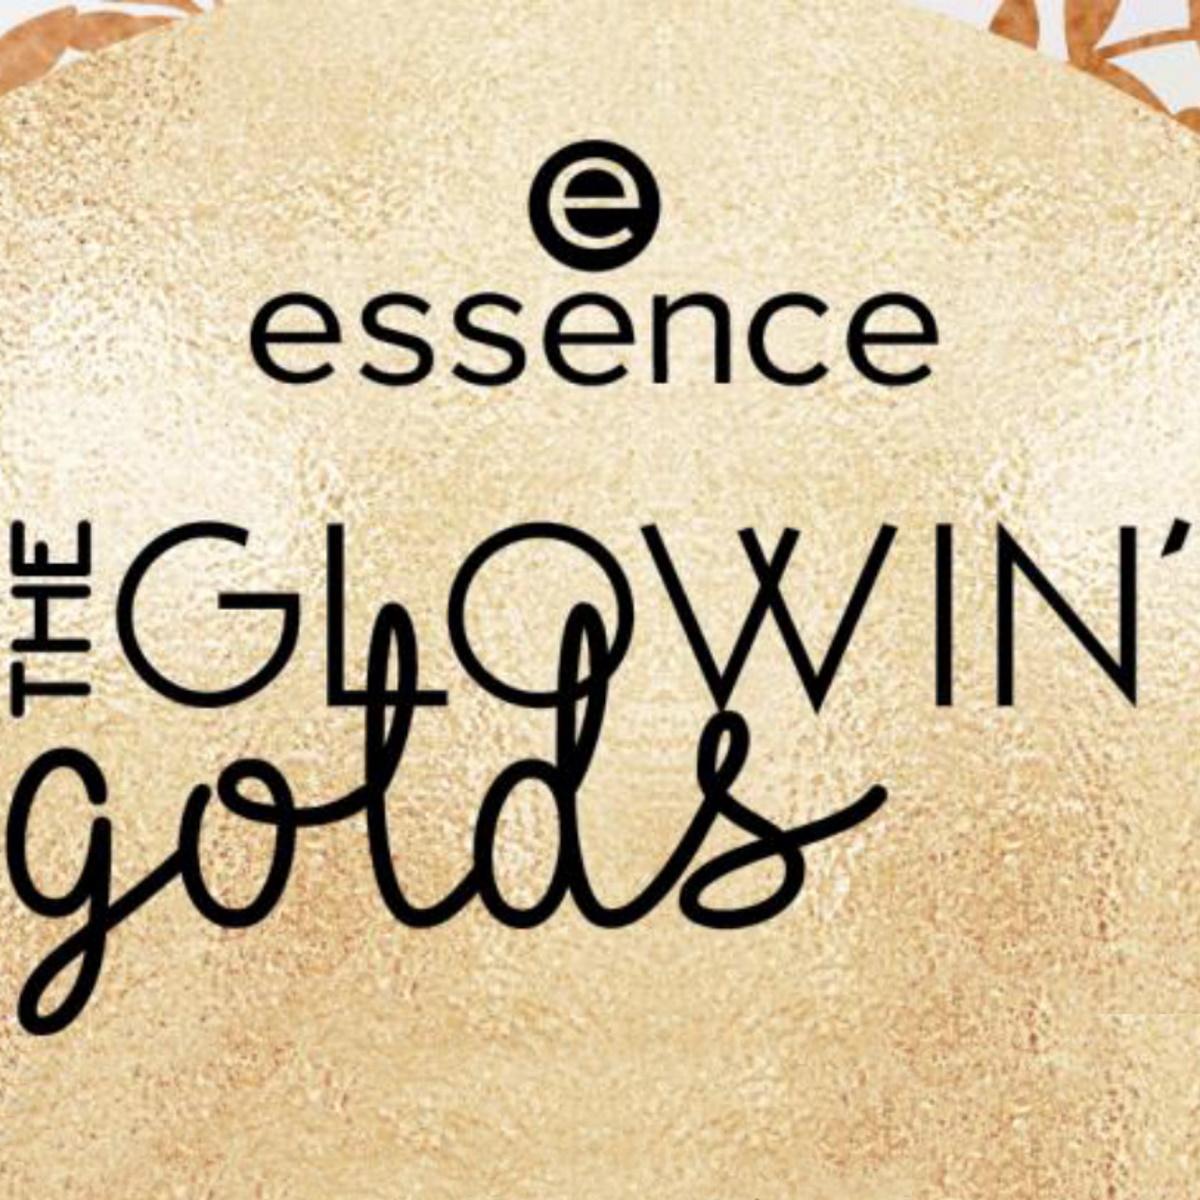 Persbericht: Essence LE The Glowin' Golds